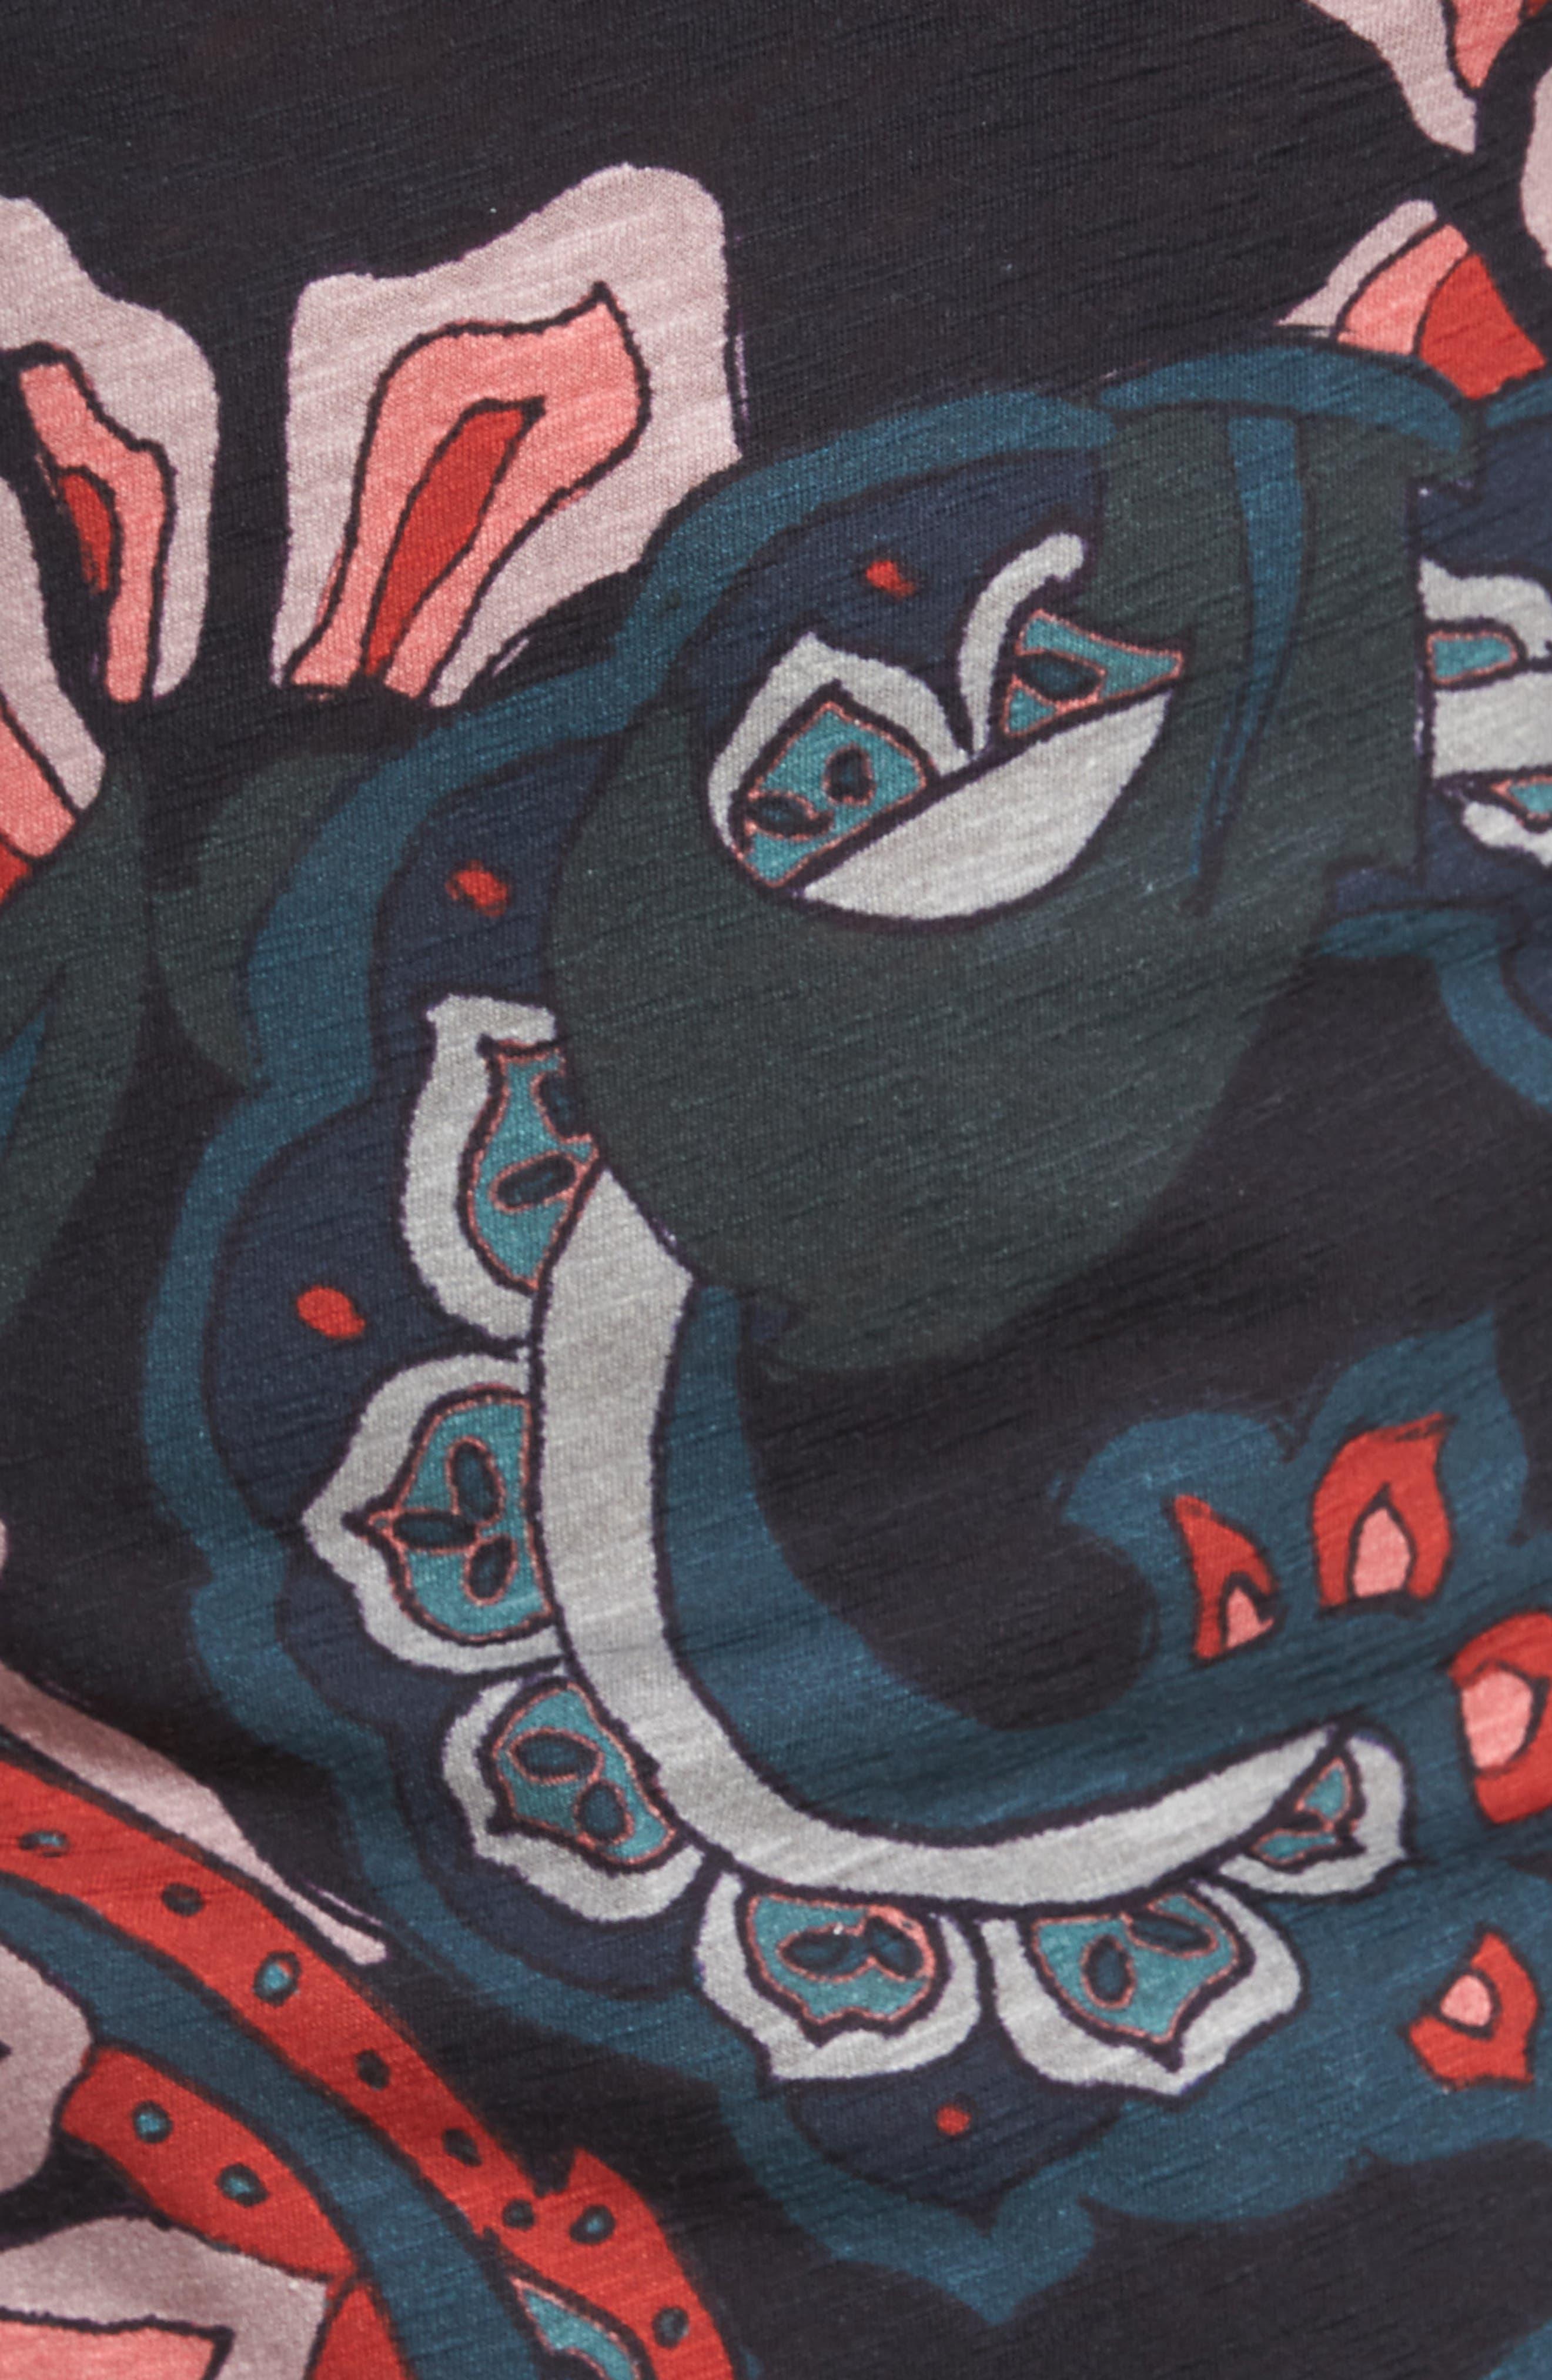 Batsby Paisley Print T-Shirt,                             Alternate thumbnail 5, color,                             601